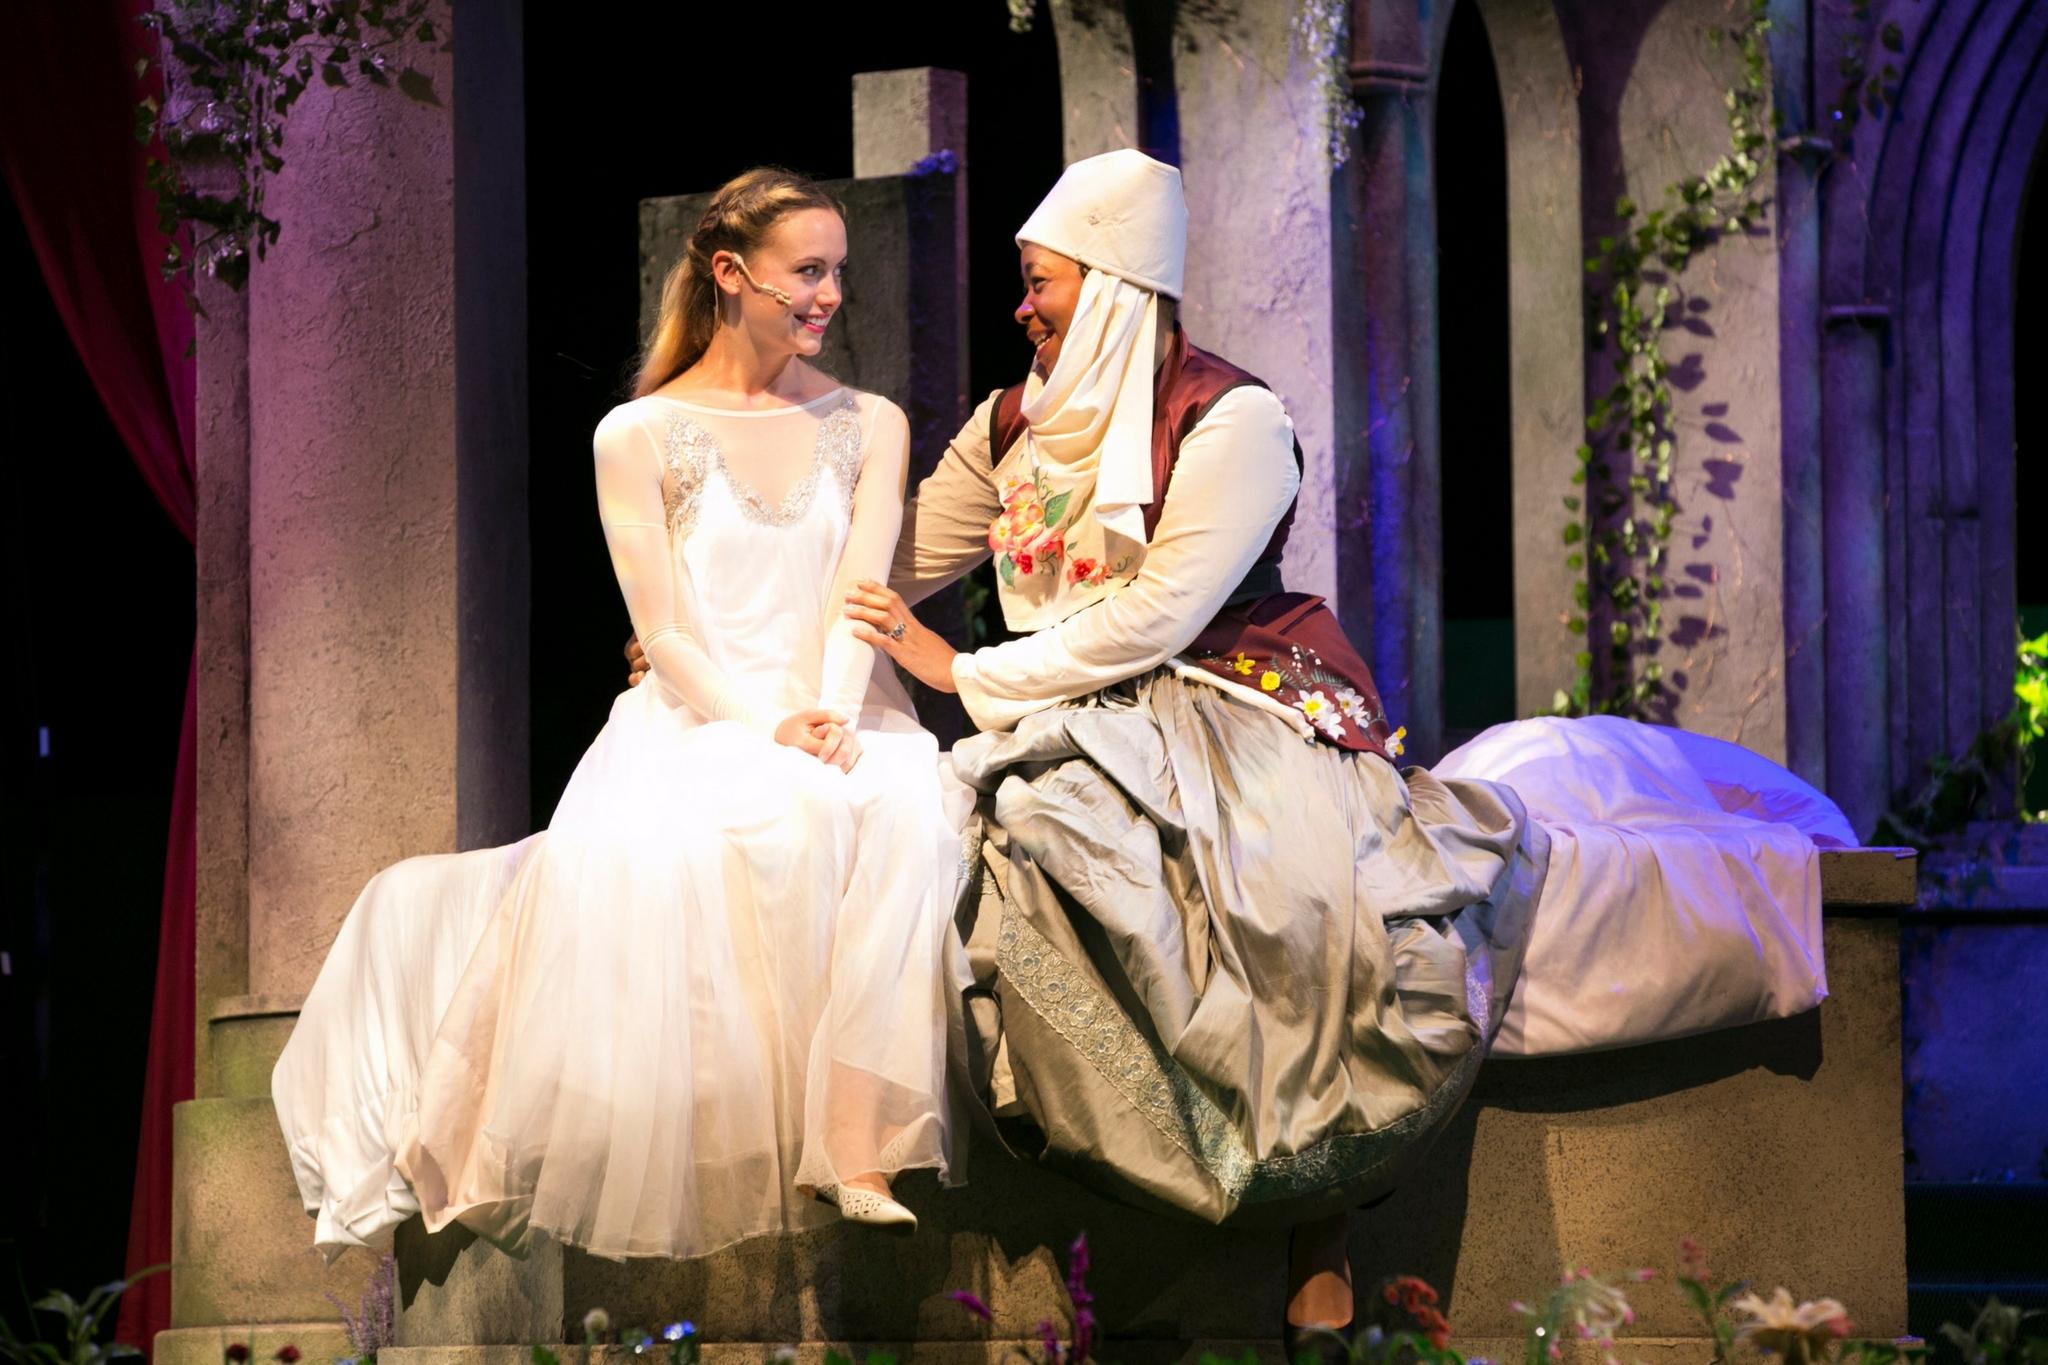 Gracyn Mix (Juliet) and Ramona Lisa Alexander (Nurse) in Romeo & Juliet, Shakespeare on the Common 2017-Photo by Evgenia Eliseeva